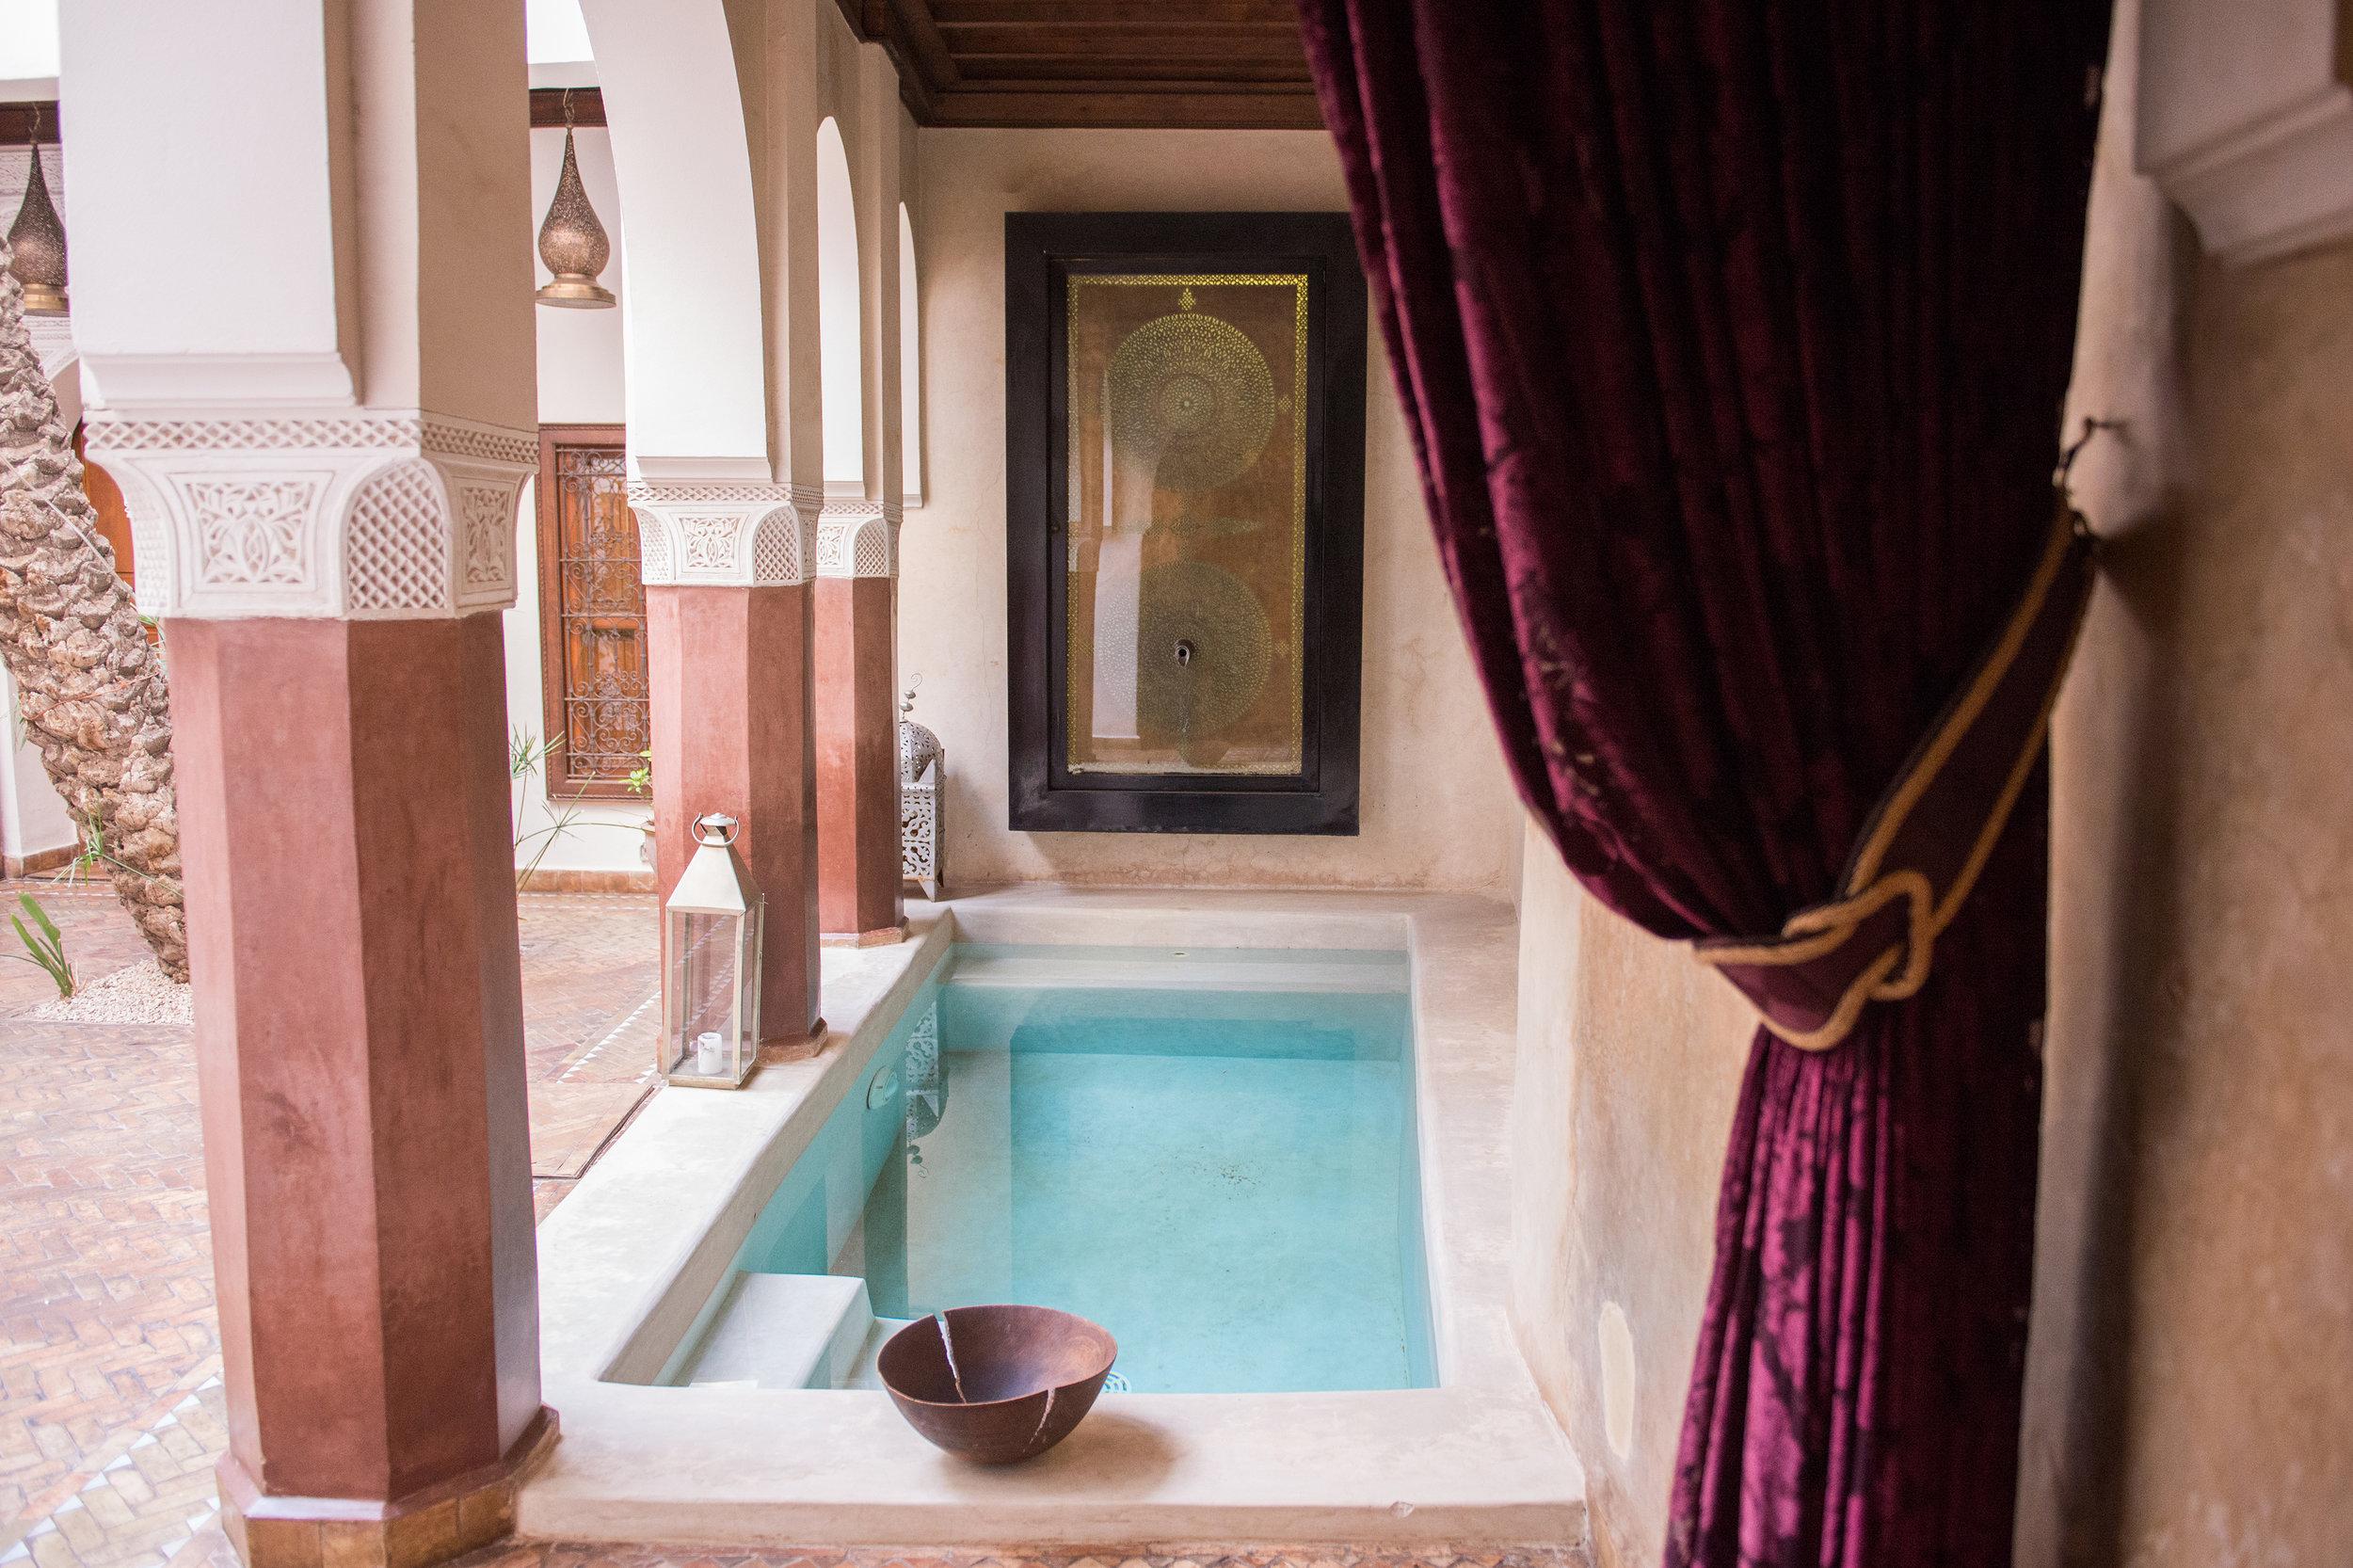 riad-zamzam-marrakech-spa-morocco-luxury-holiday-05